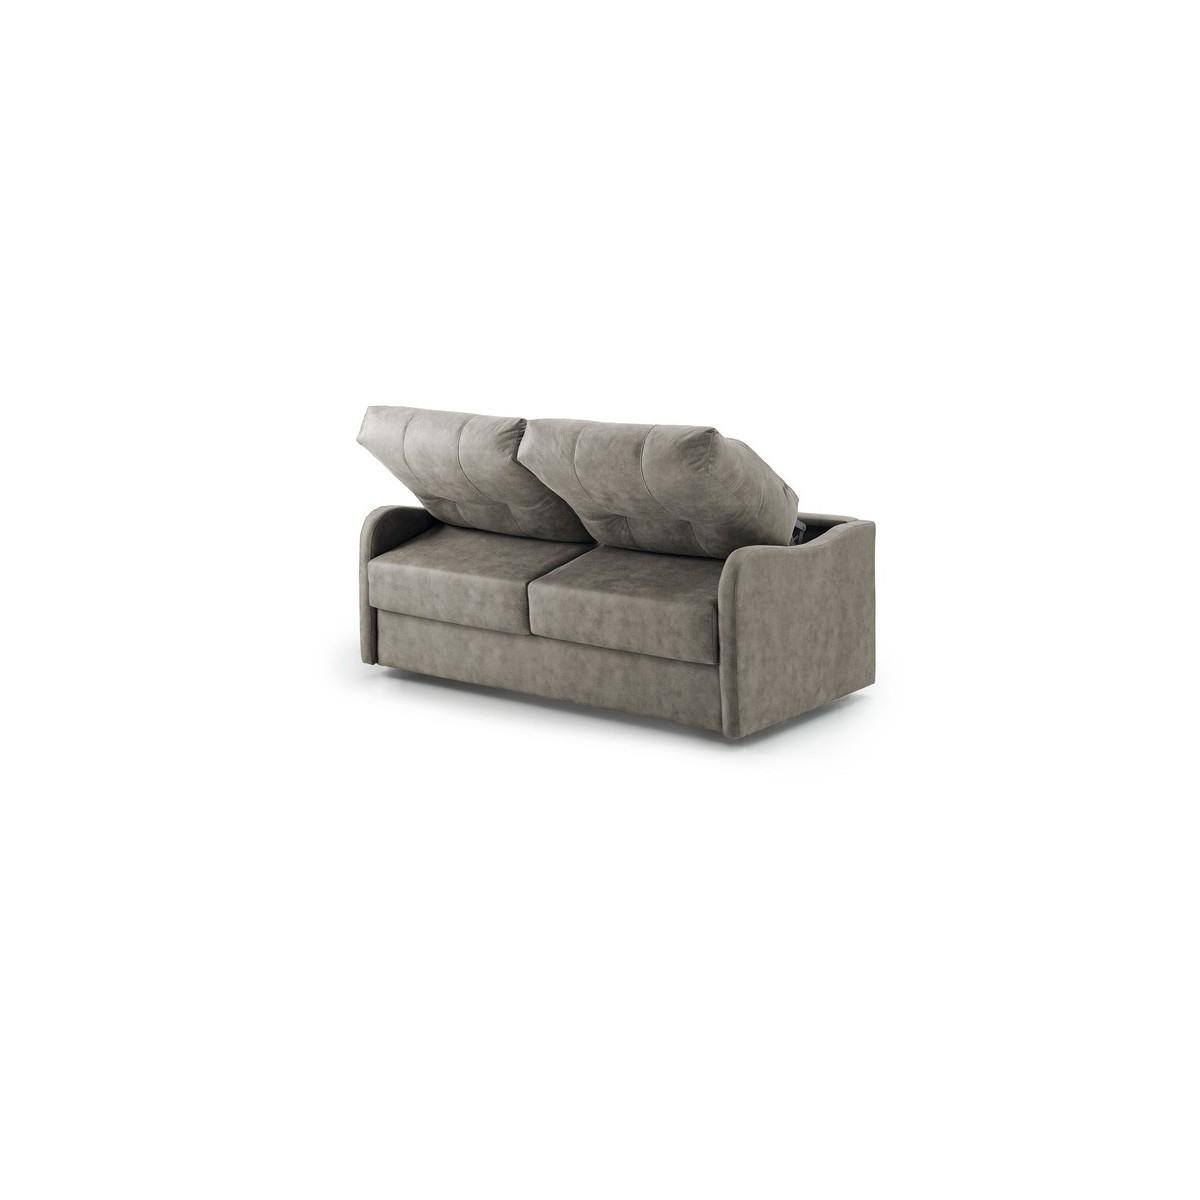 Sof cama compacto sistema italiano modelo compact mubeko for Sofa cama sistema italiano